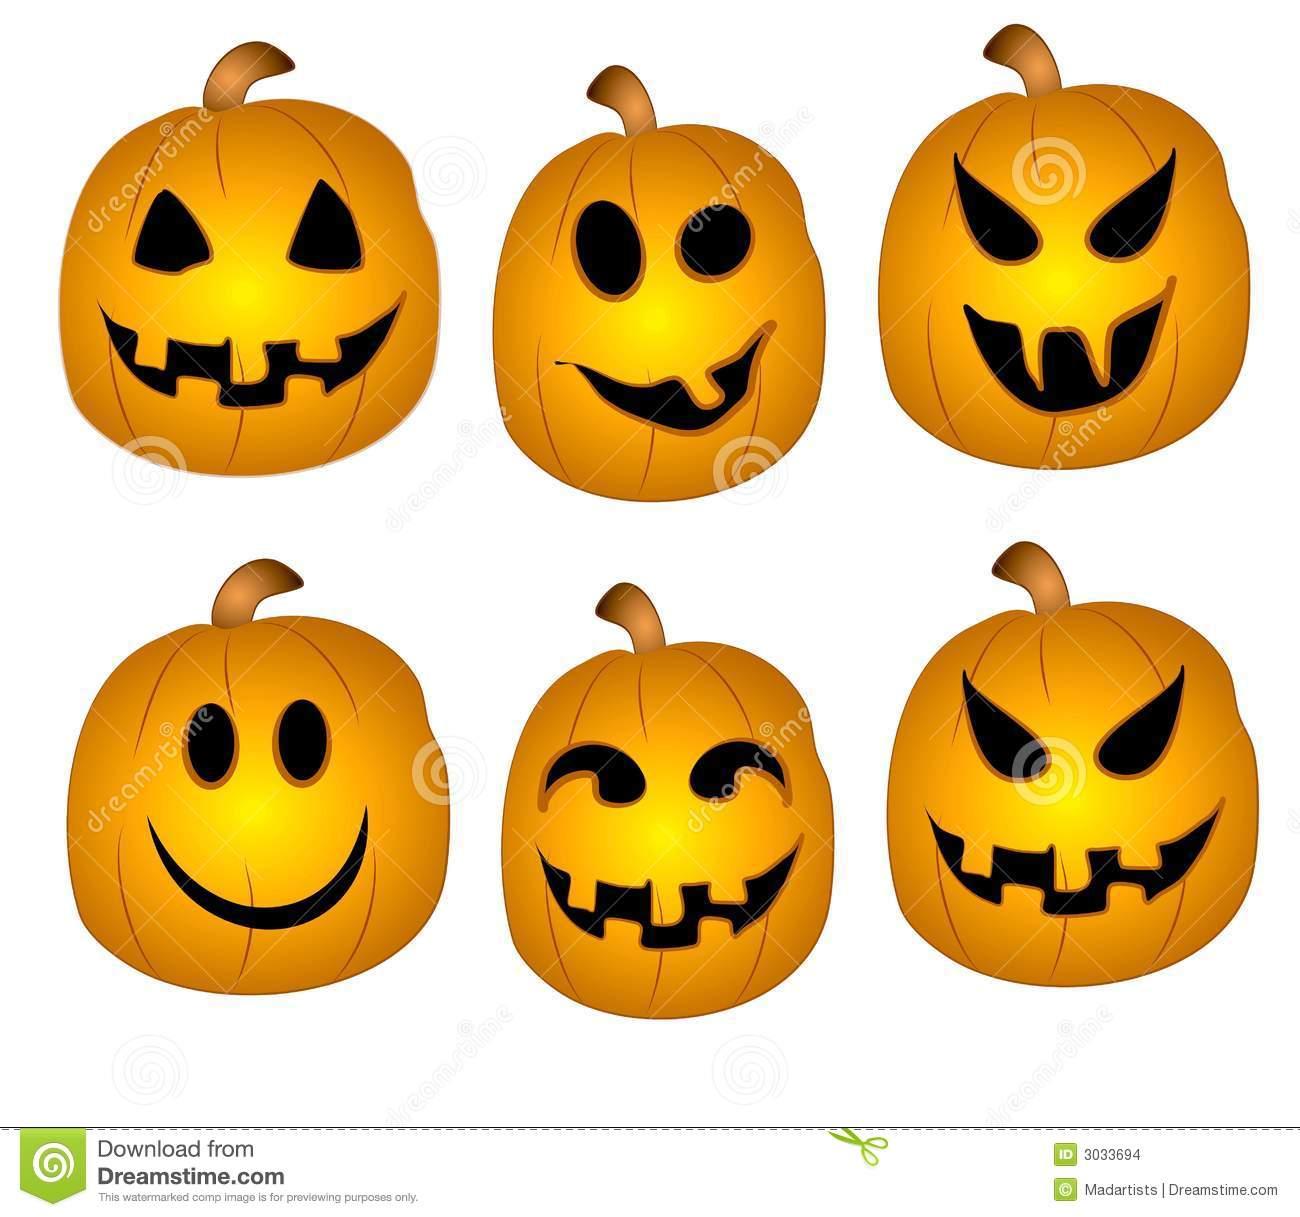 Cute Pumpkins Face Clipart Suggest